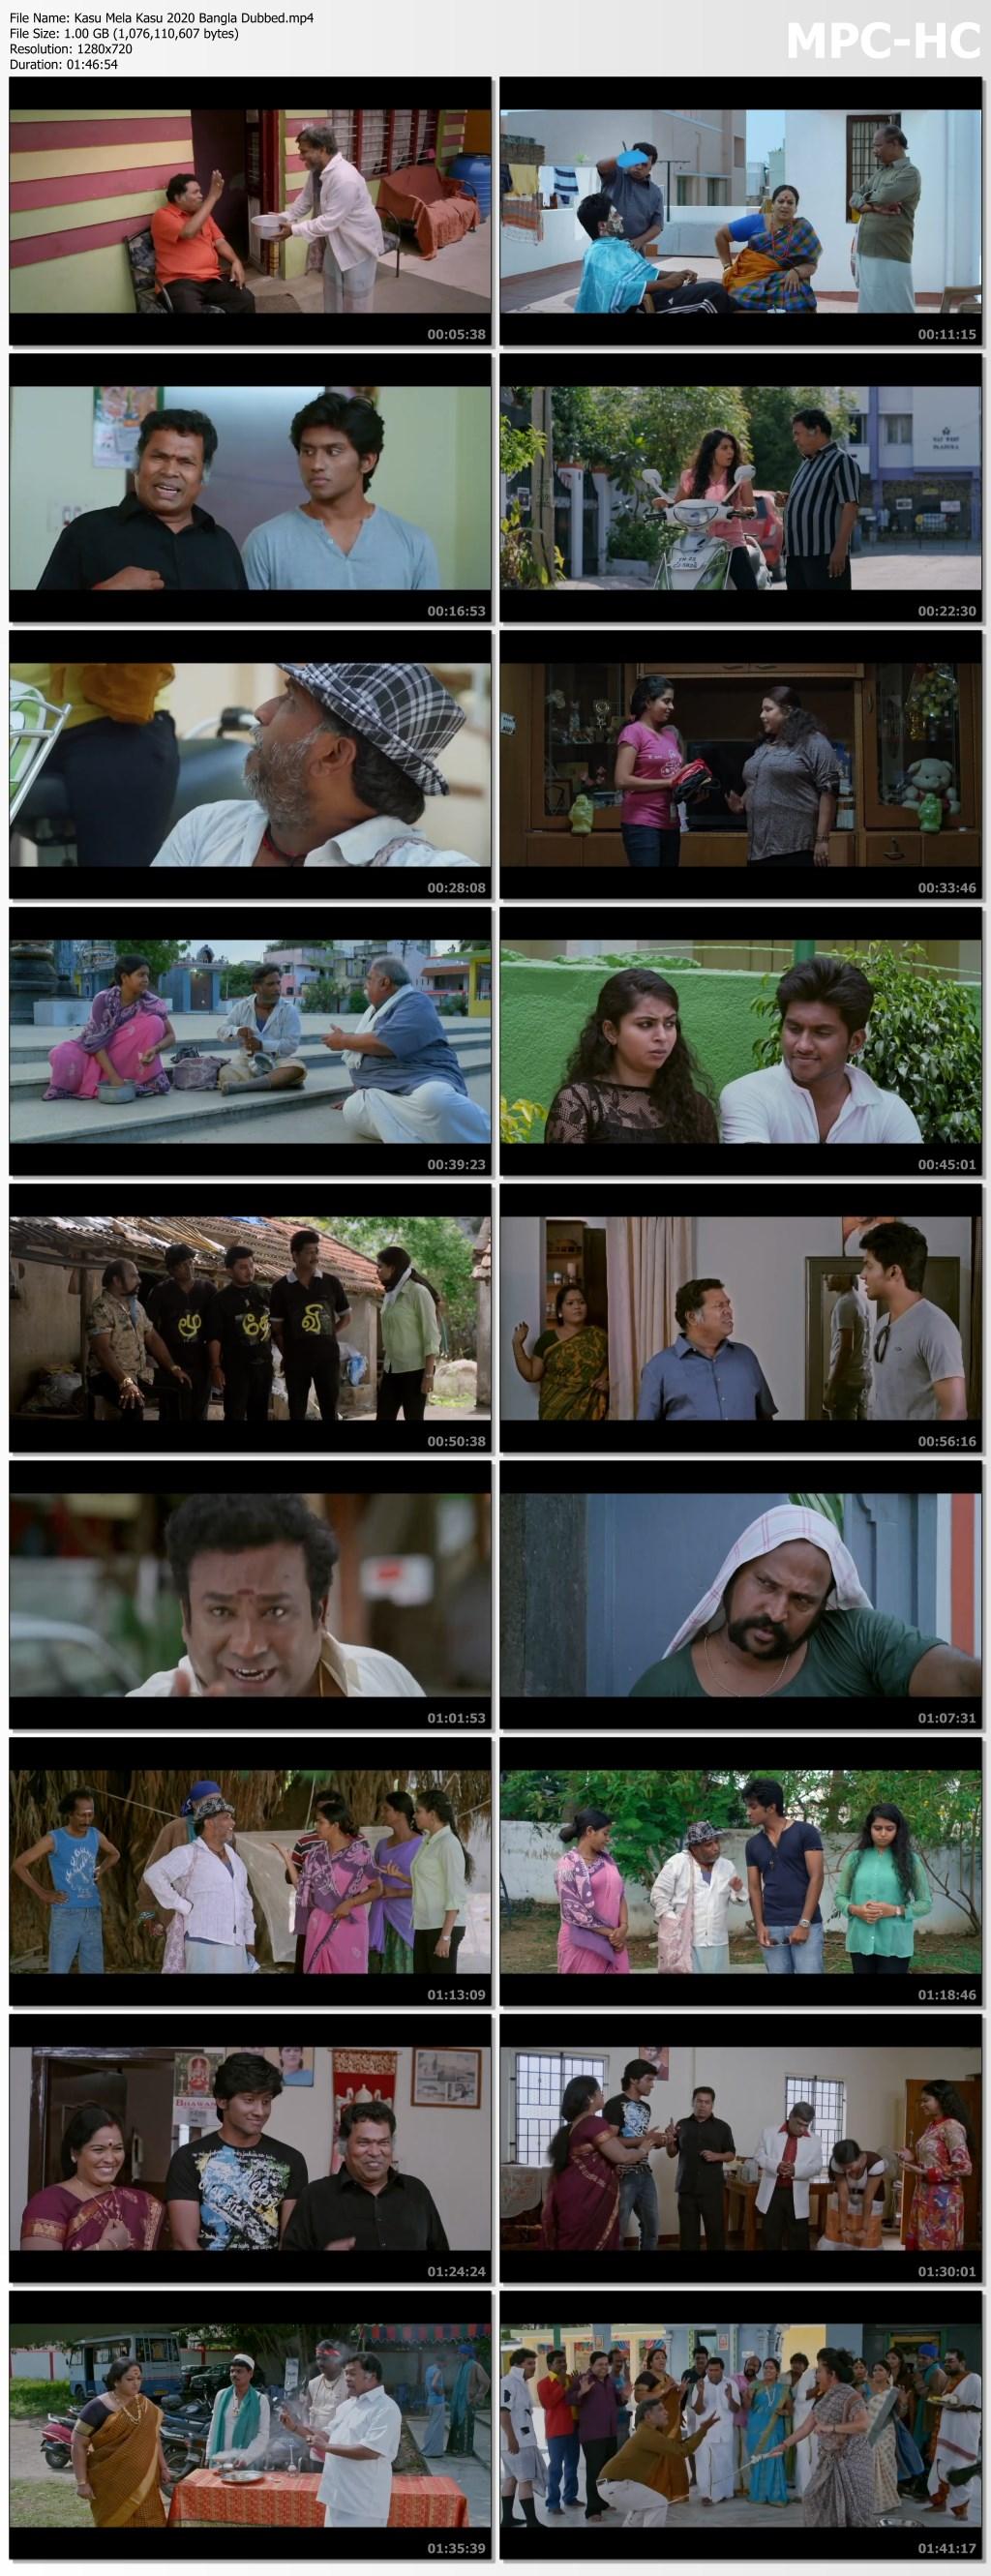 Kasu Mela Kasu 2020 Bangla Dubbed.mp4 thumbs